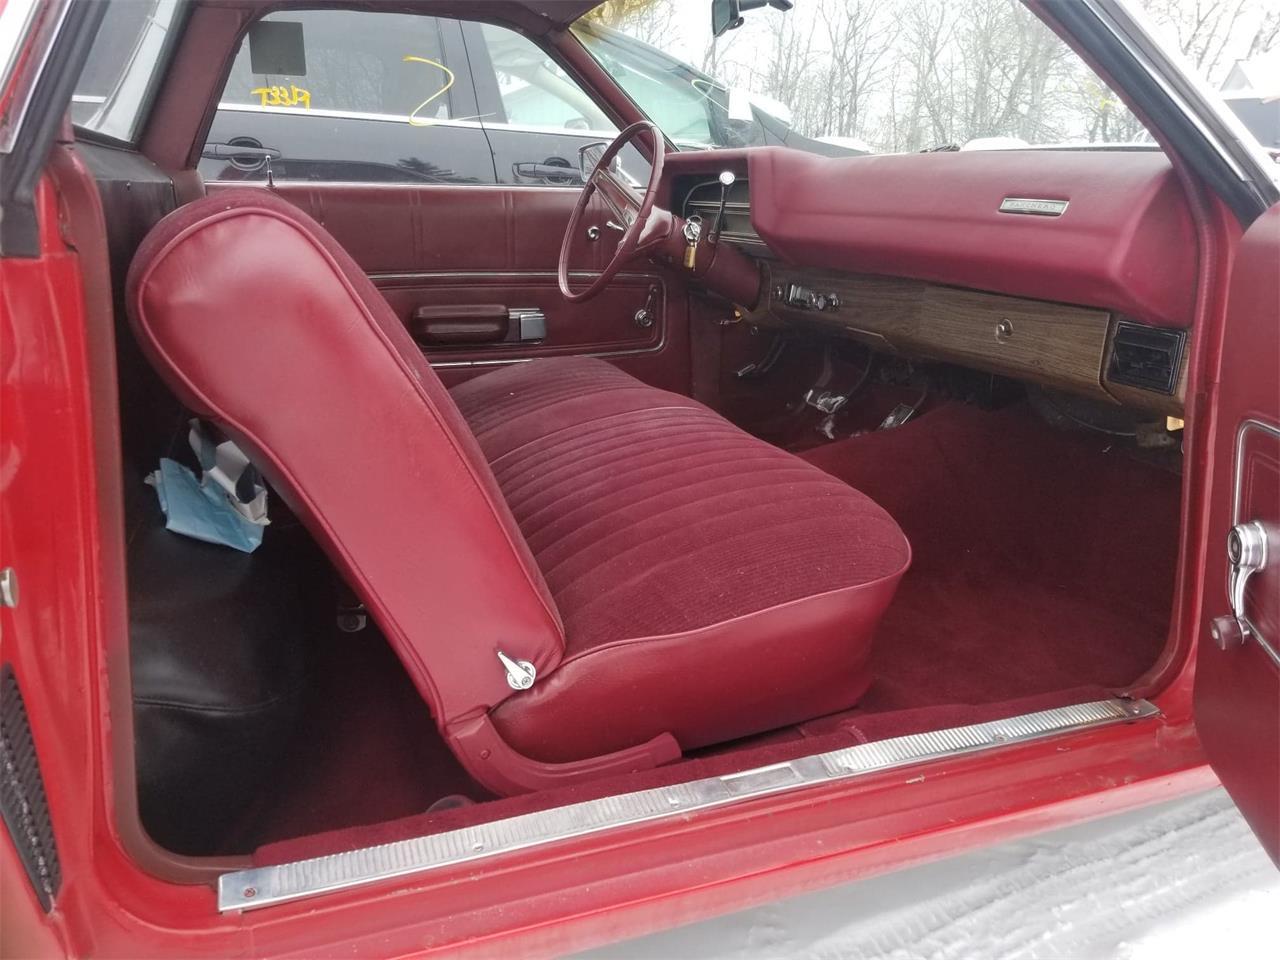 1970 Ford Ranchero Squire, '70 Ranchero Squire still has original 351cid V8, ClassicCars.com Journal